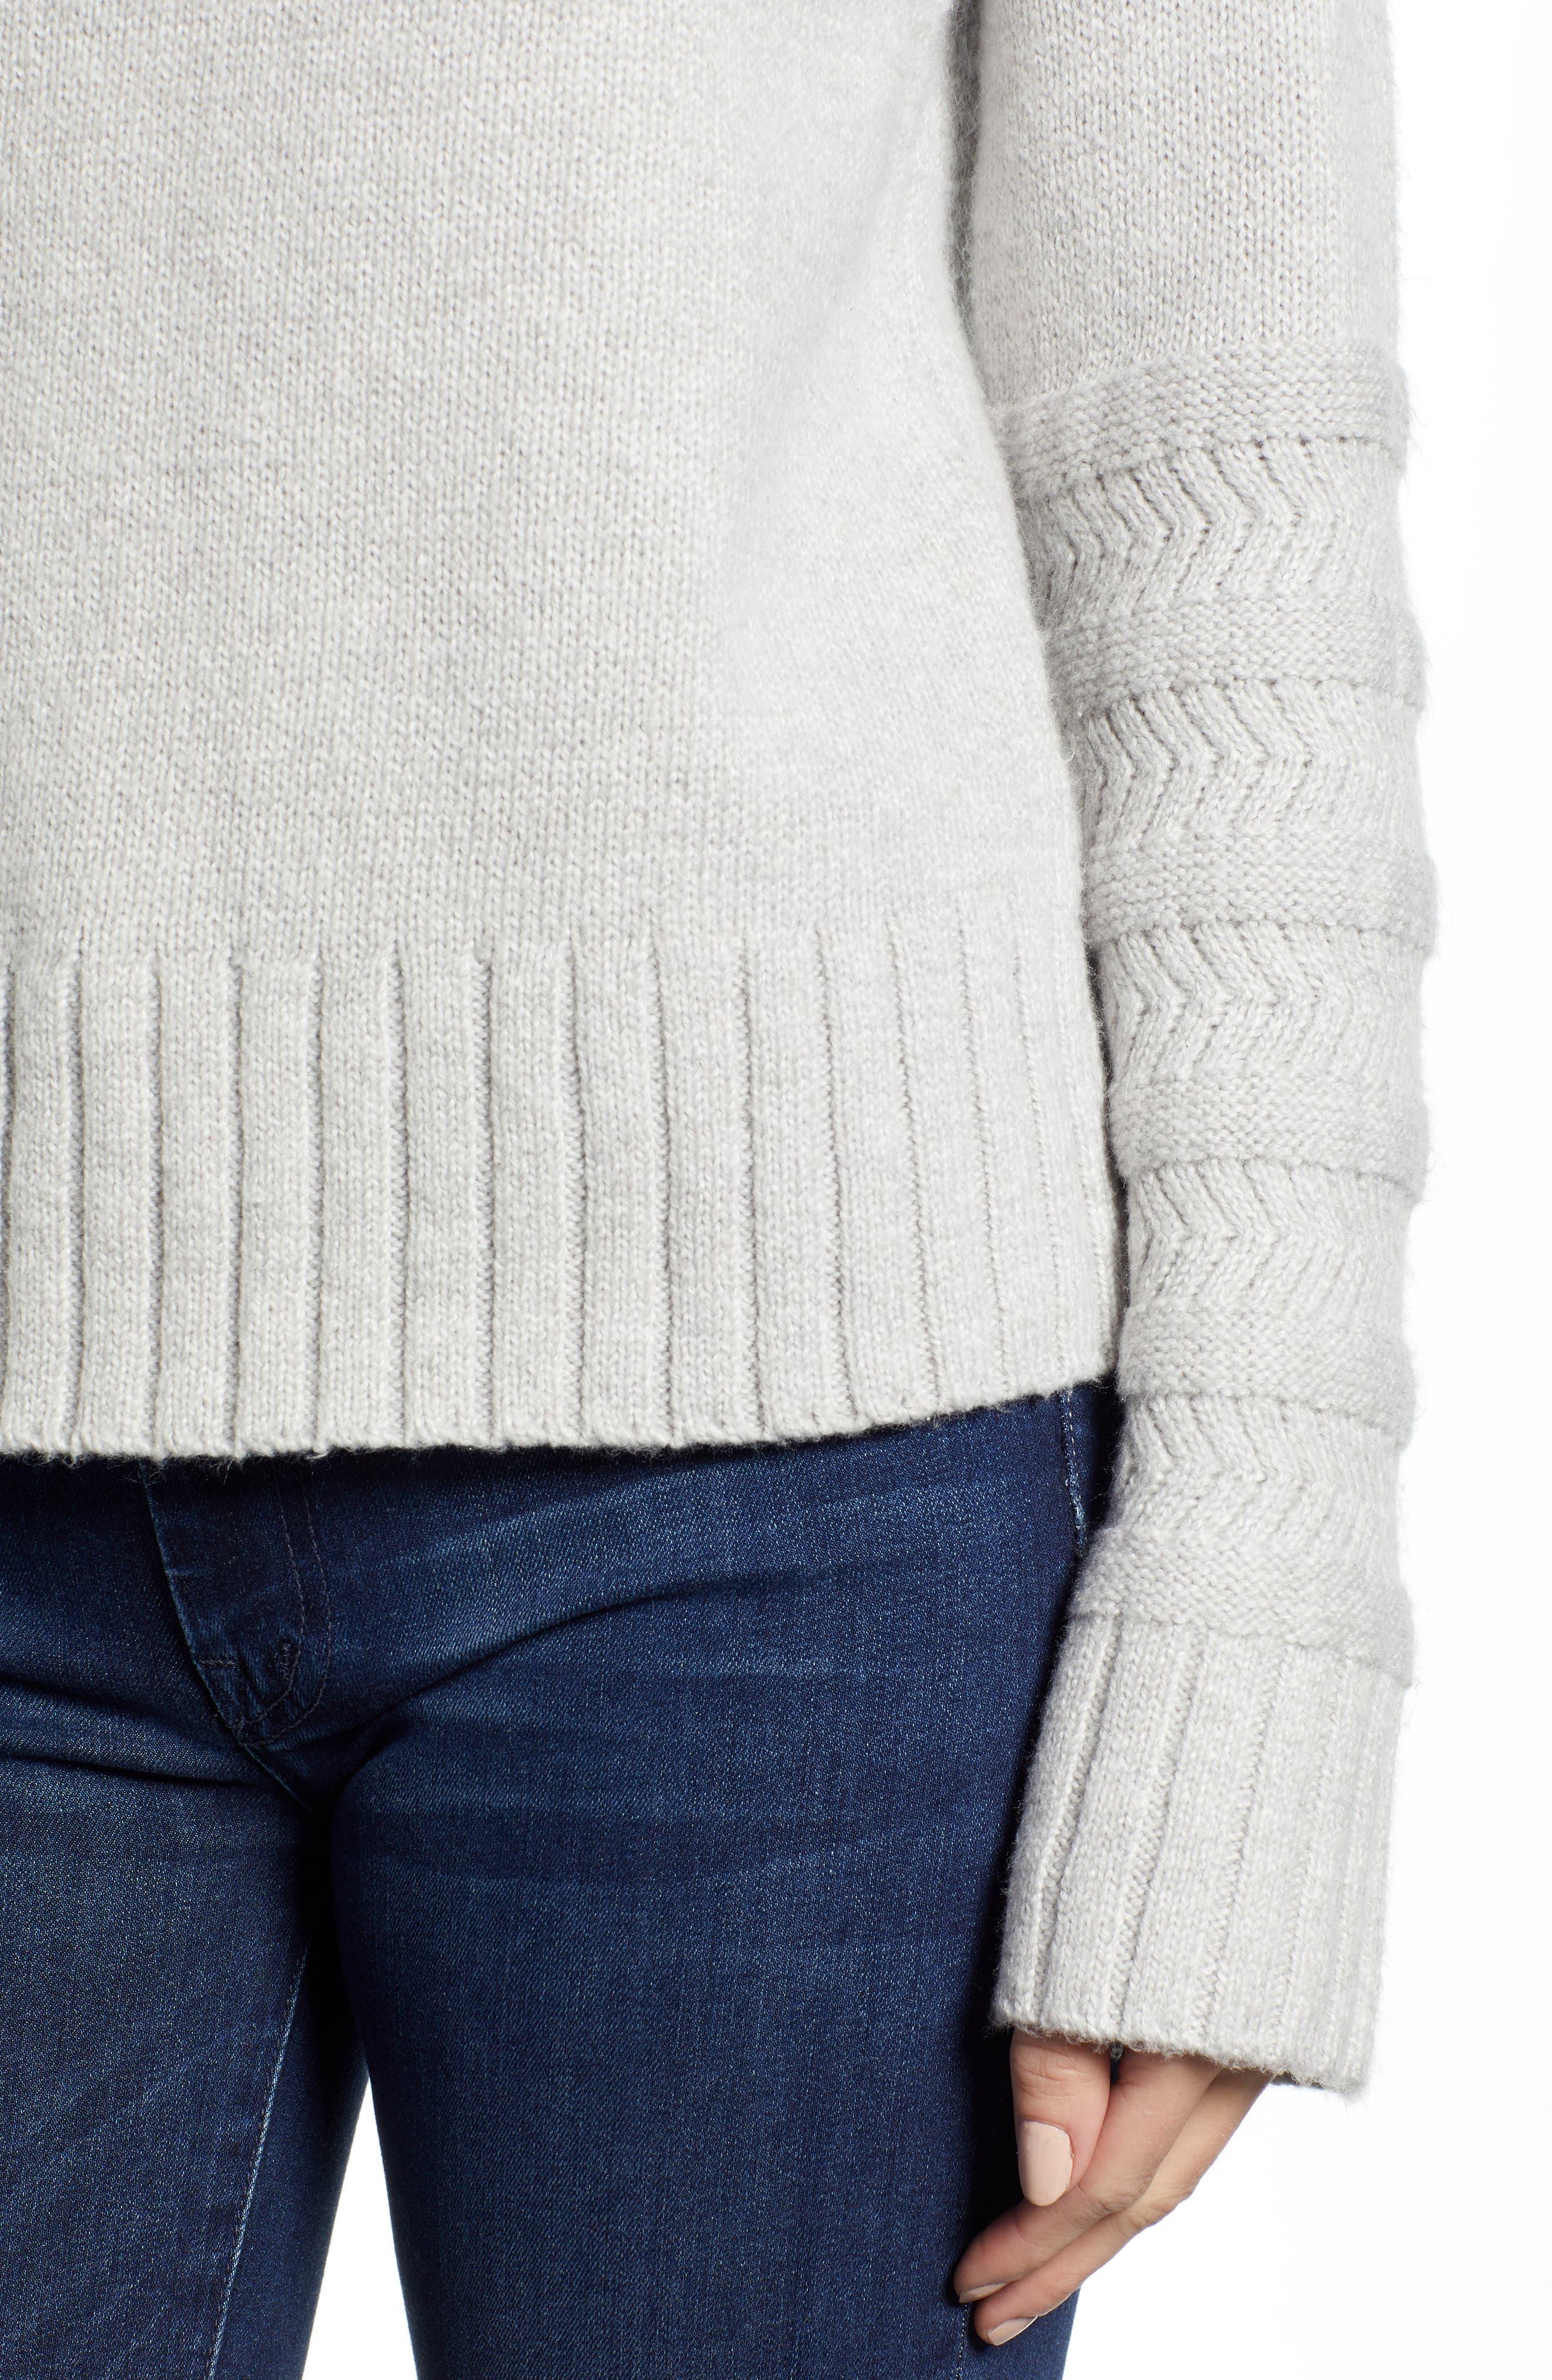 Turtleneck Sweater,                             Alternate thumbnail 4, color,                             GREY LIGHT HEATHER